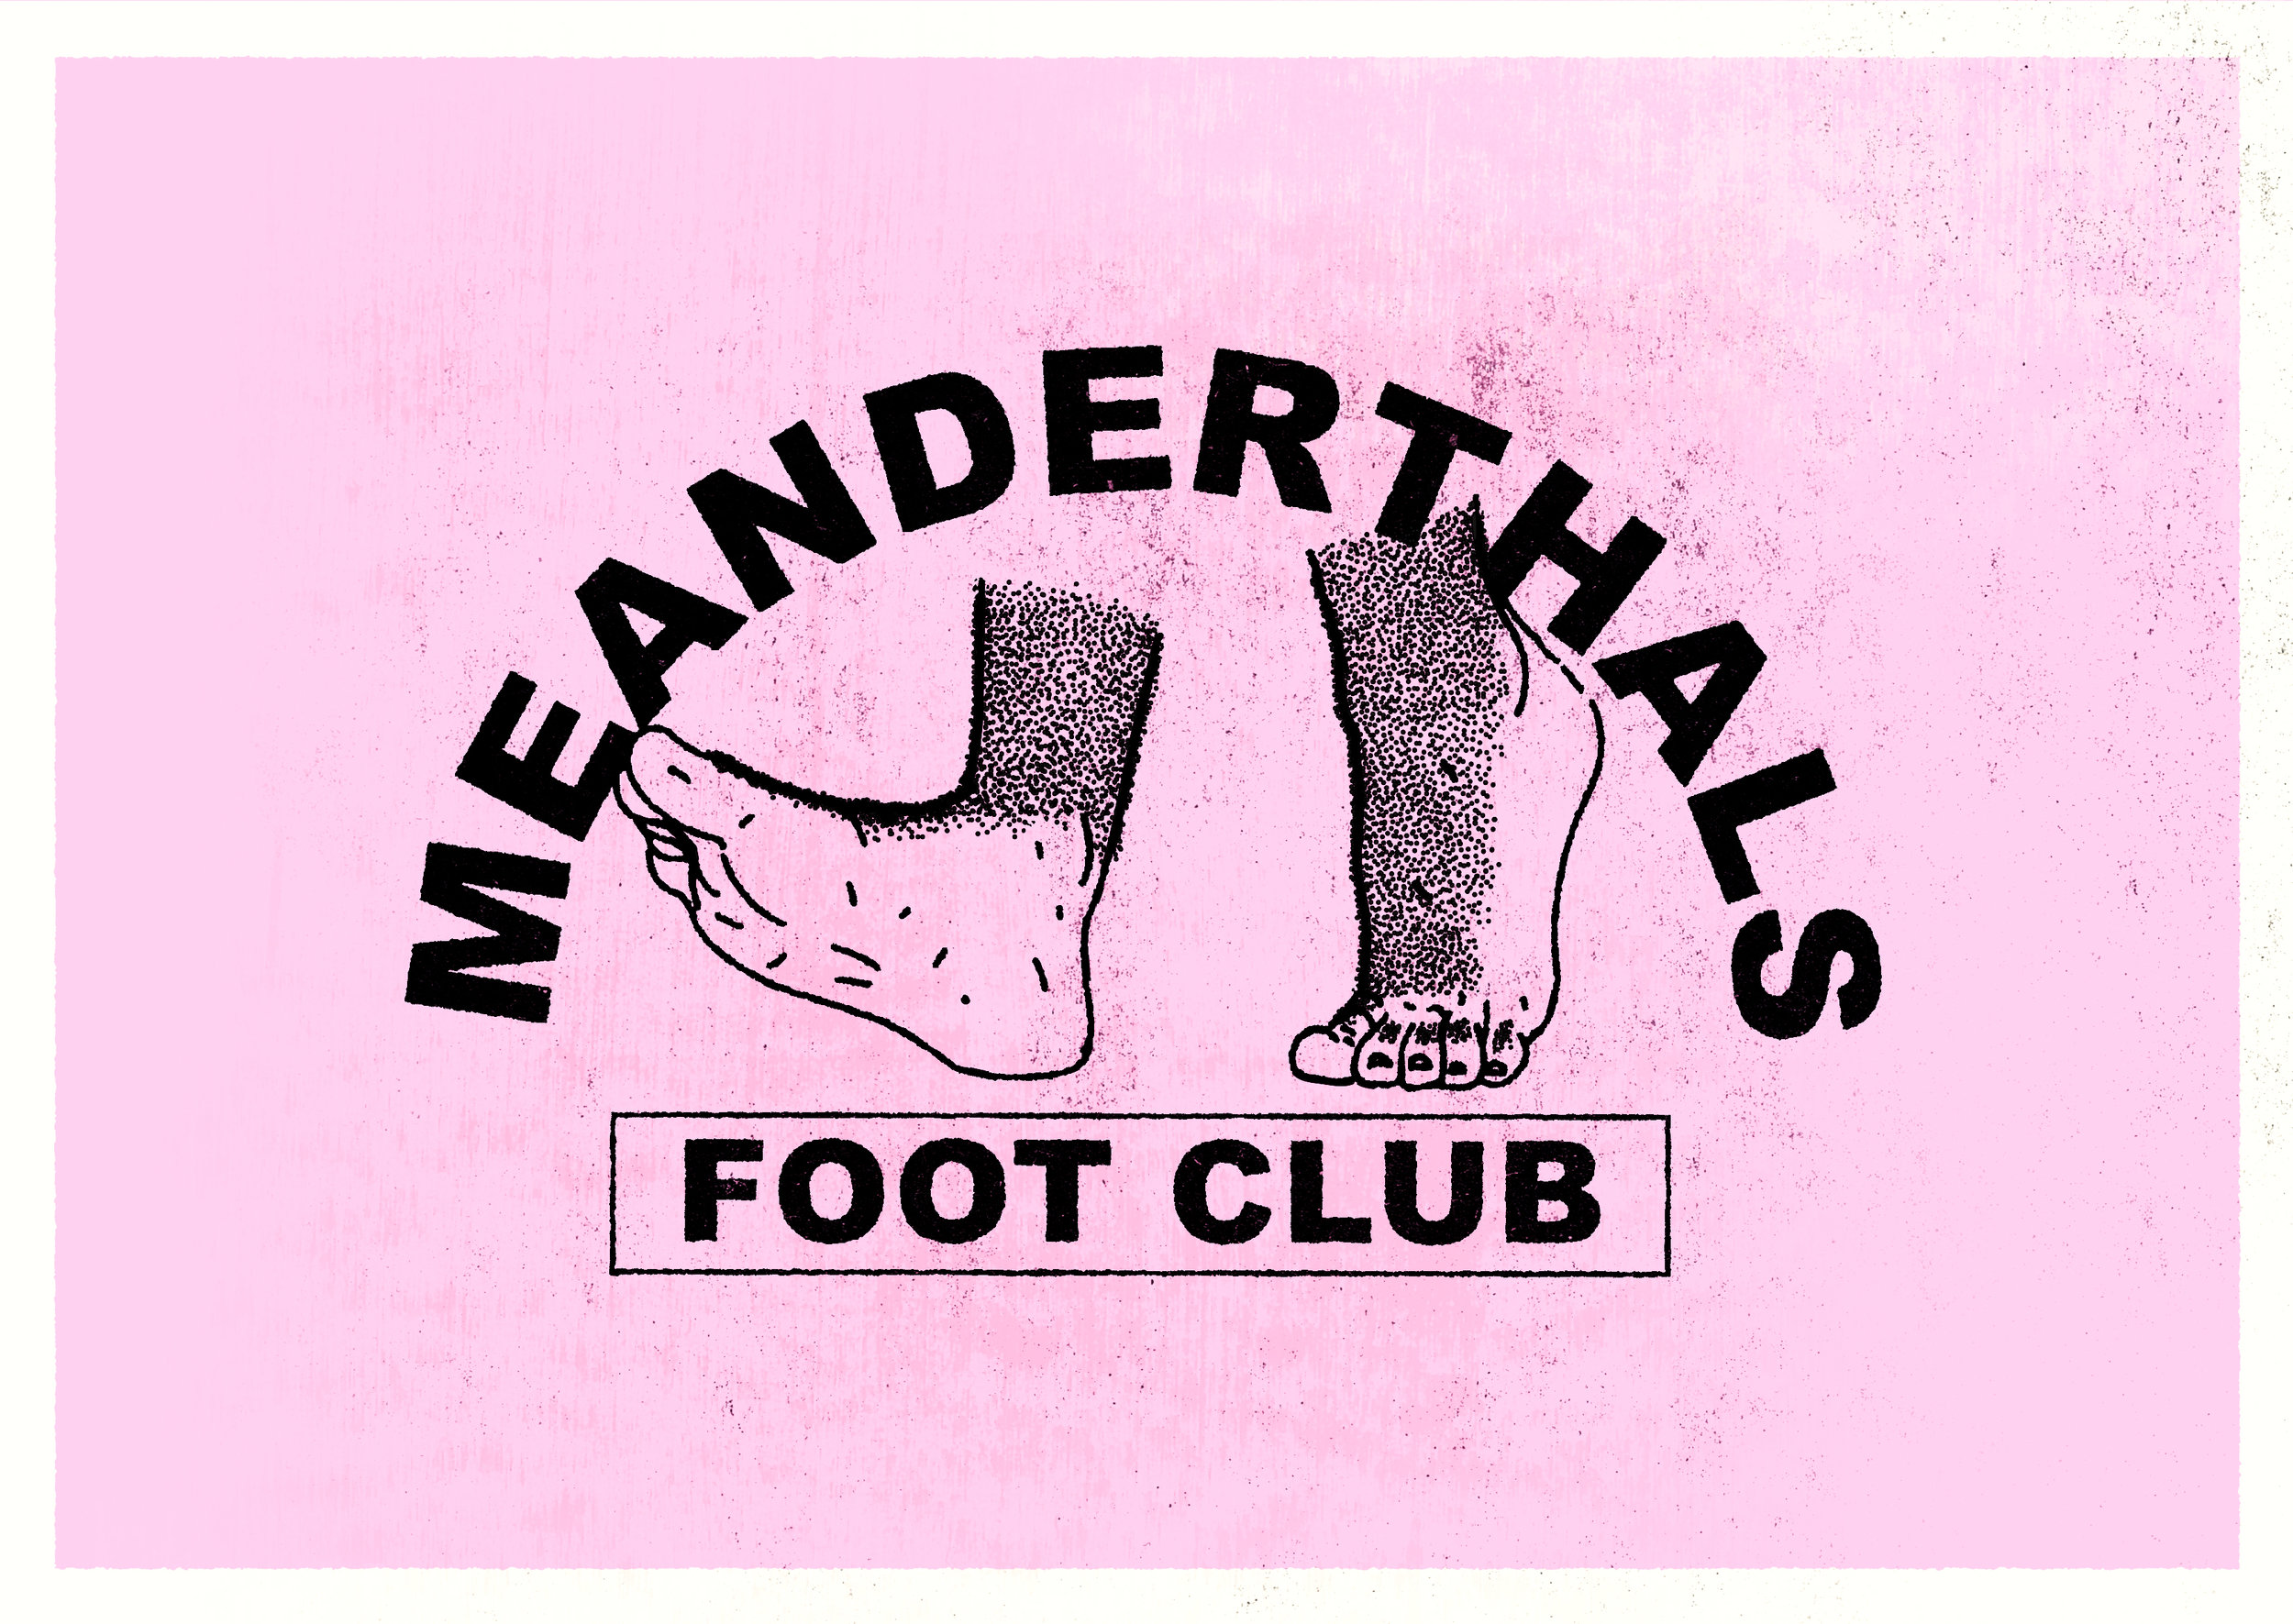 Meaderthal-Logo.jpg